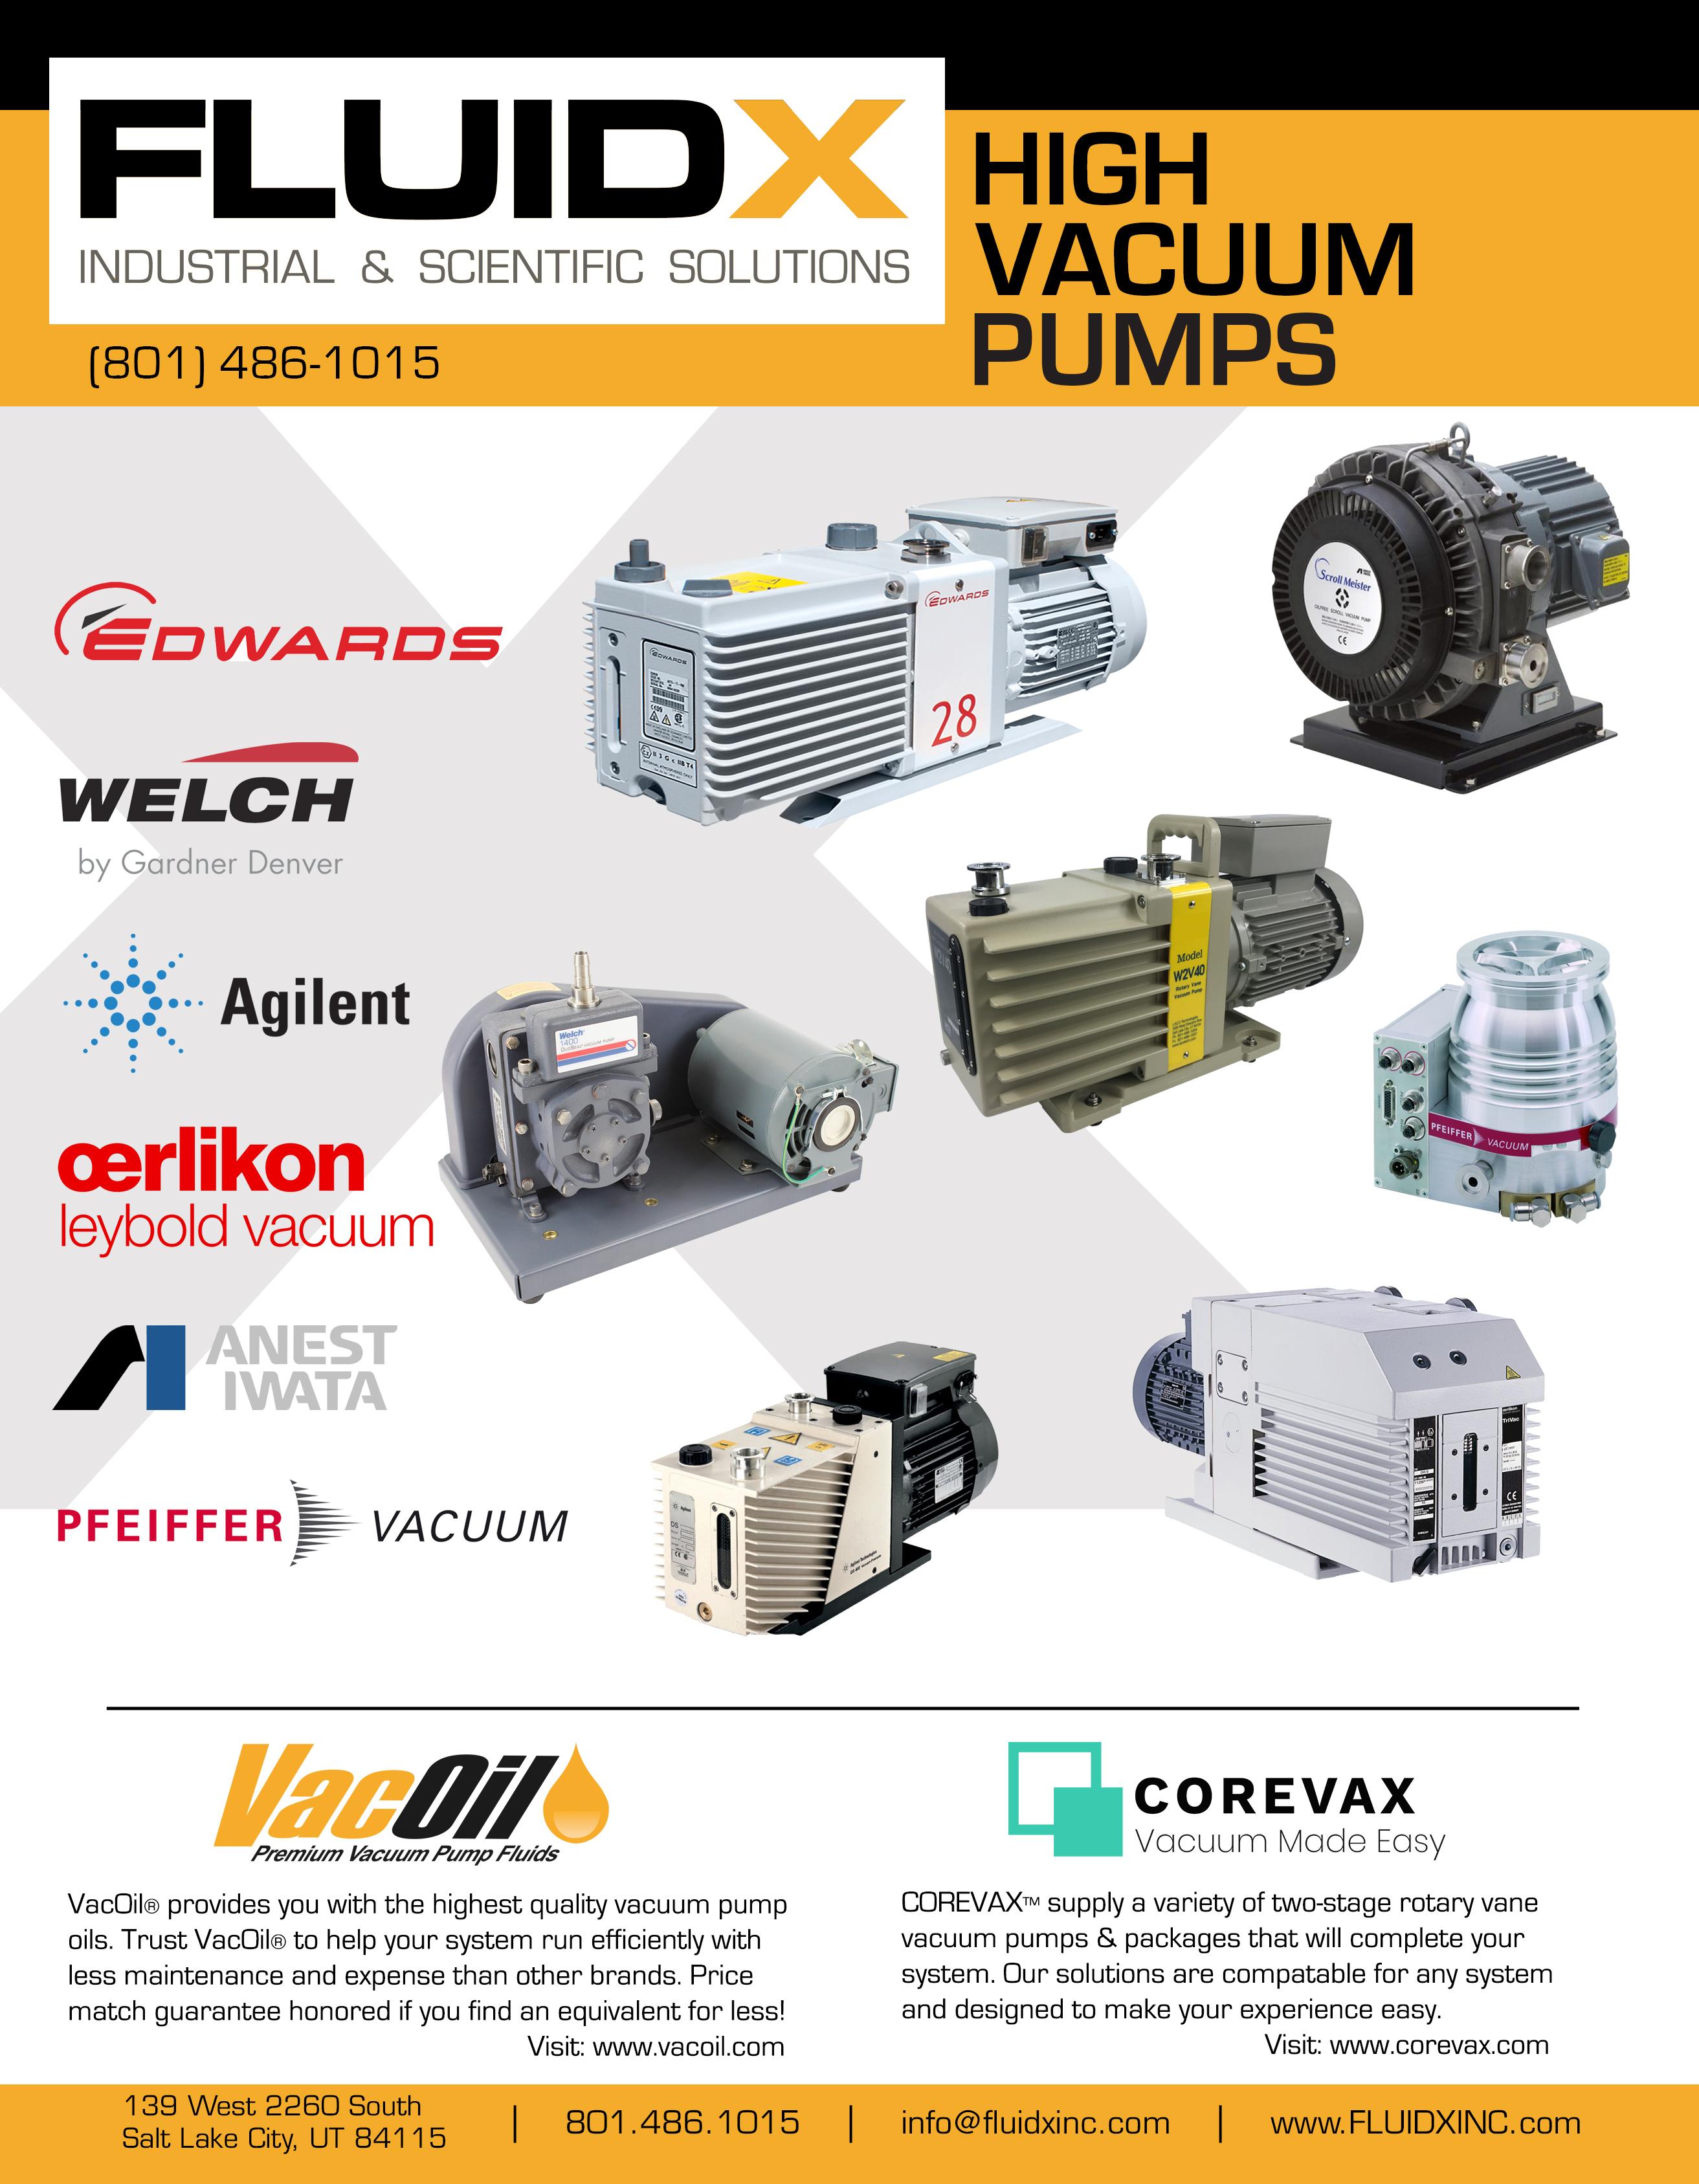 high-vacuum-pumps2.jpg